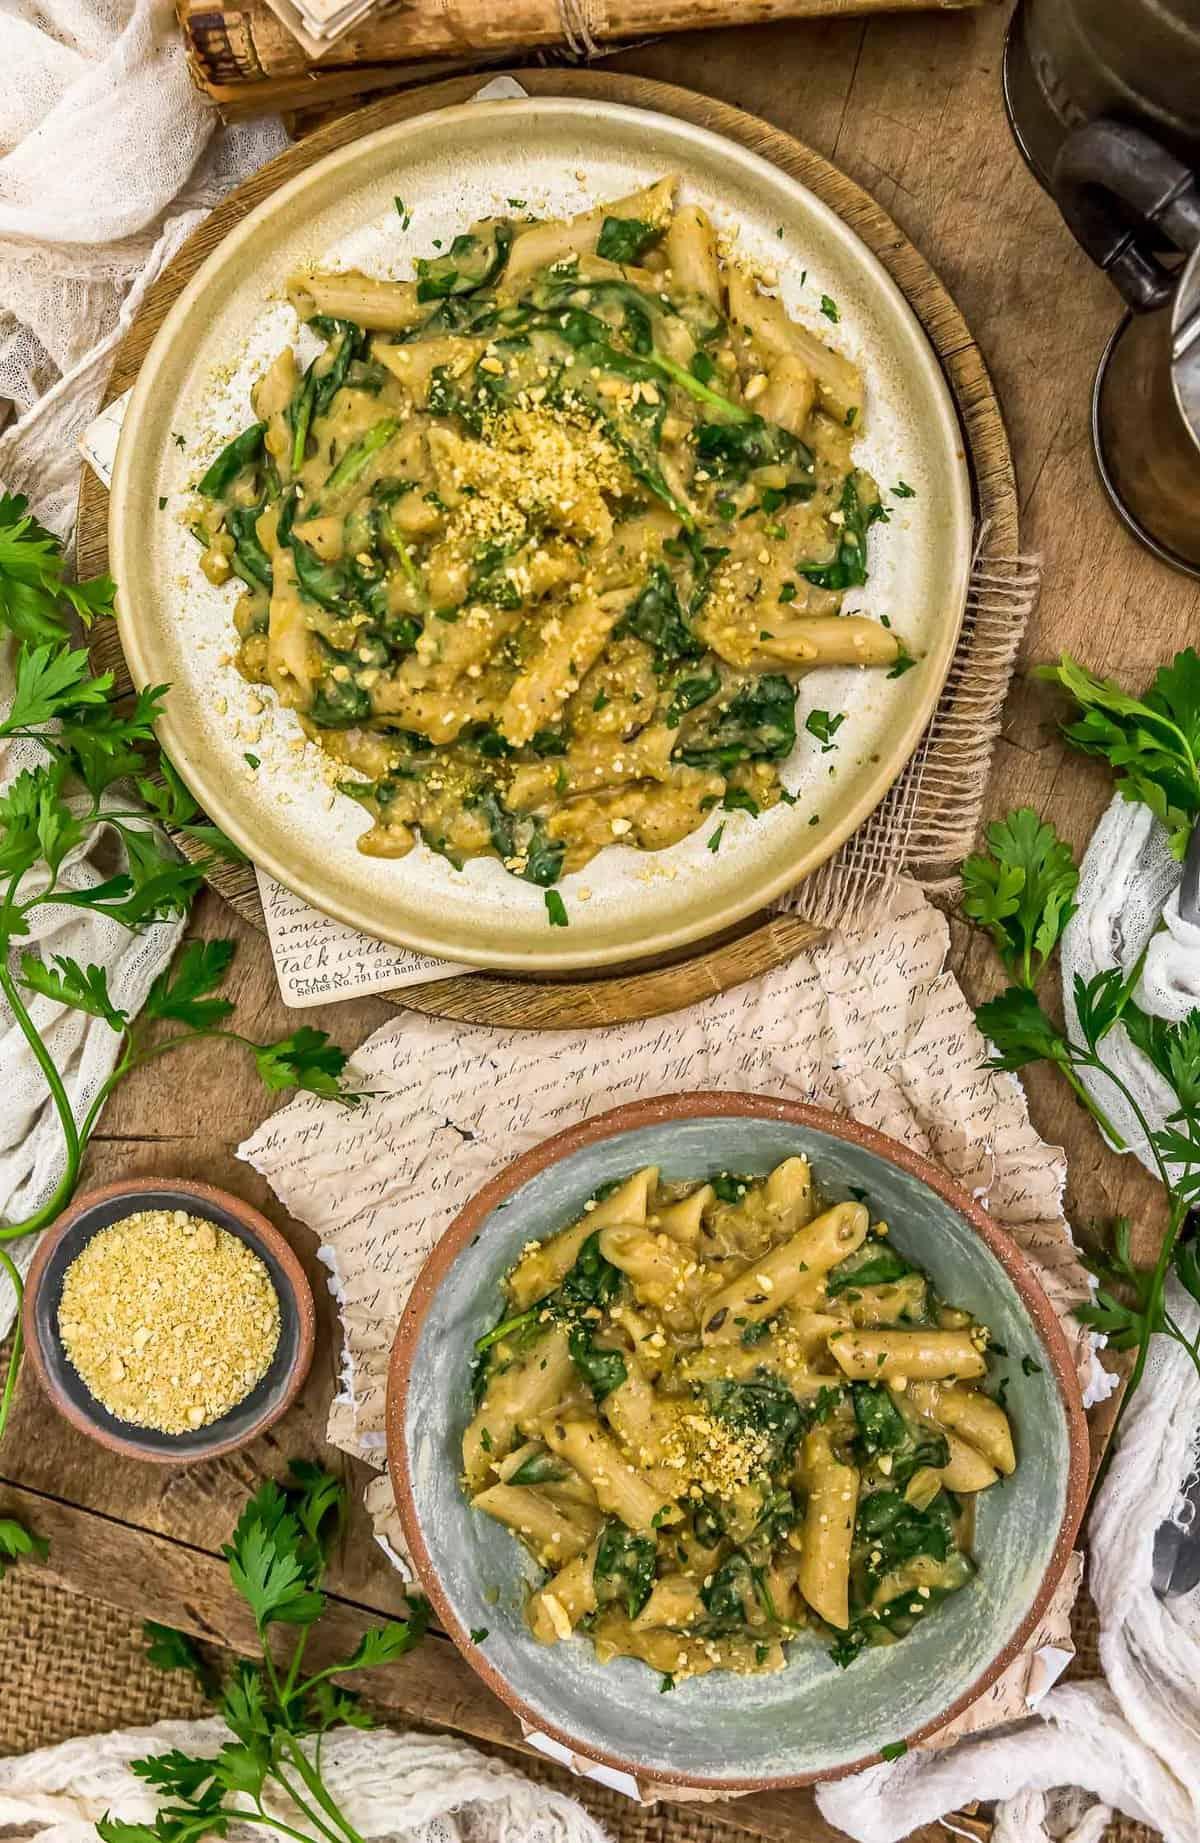 Tablescape of Vegan Creamy Spinach Pasta